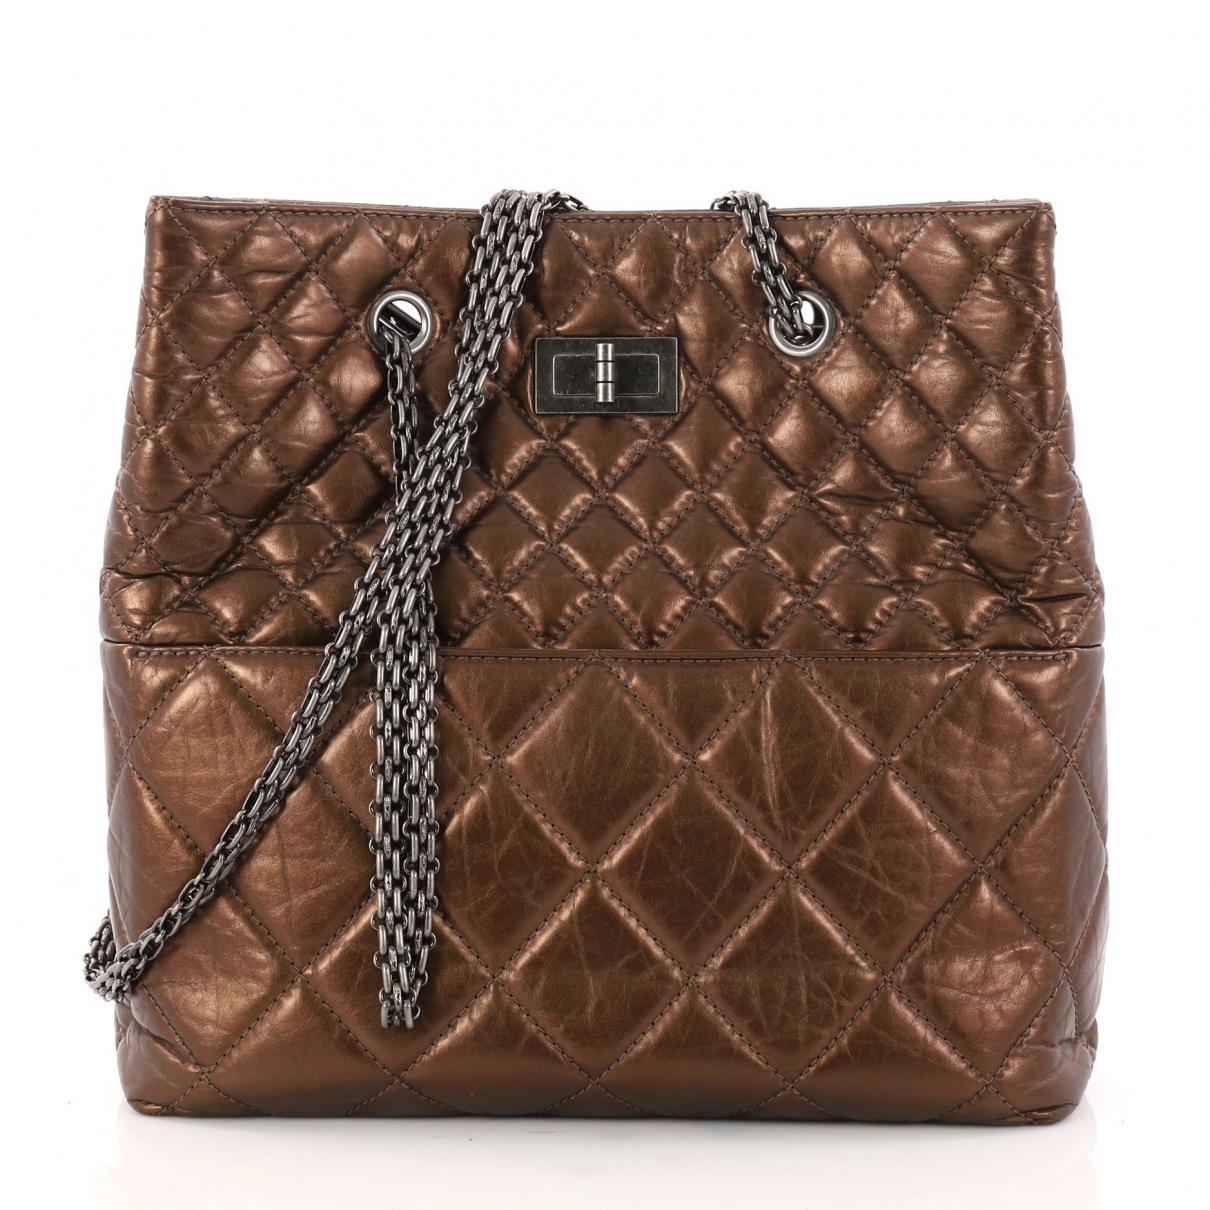 Chanel Women S Metallic Pre Owned Leather Handbag